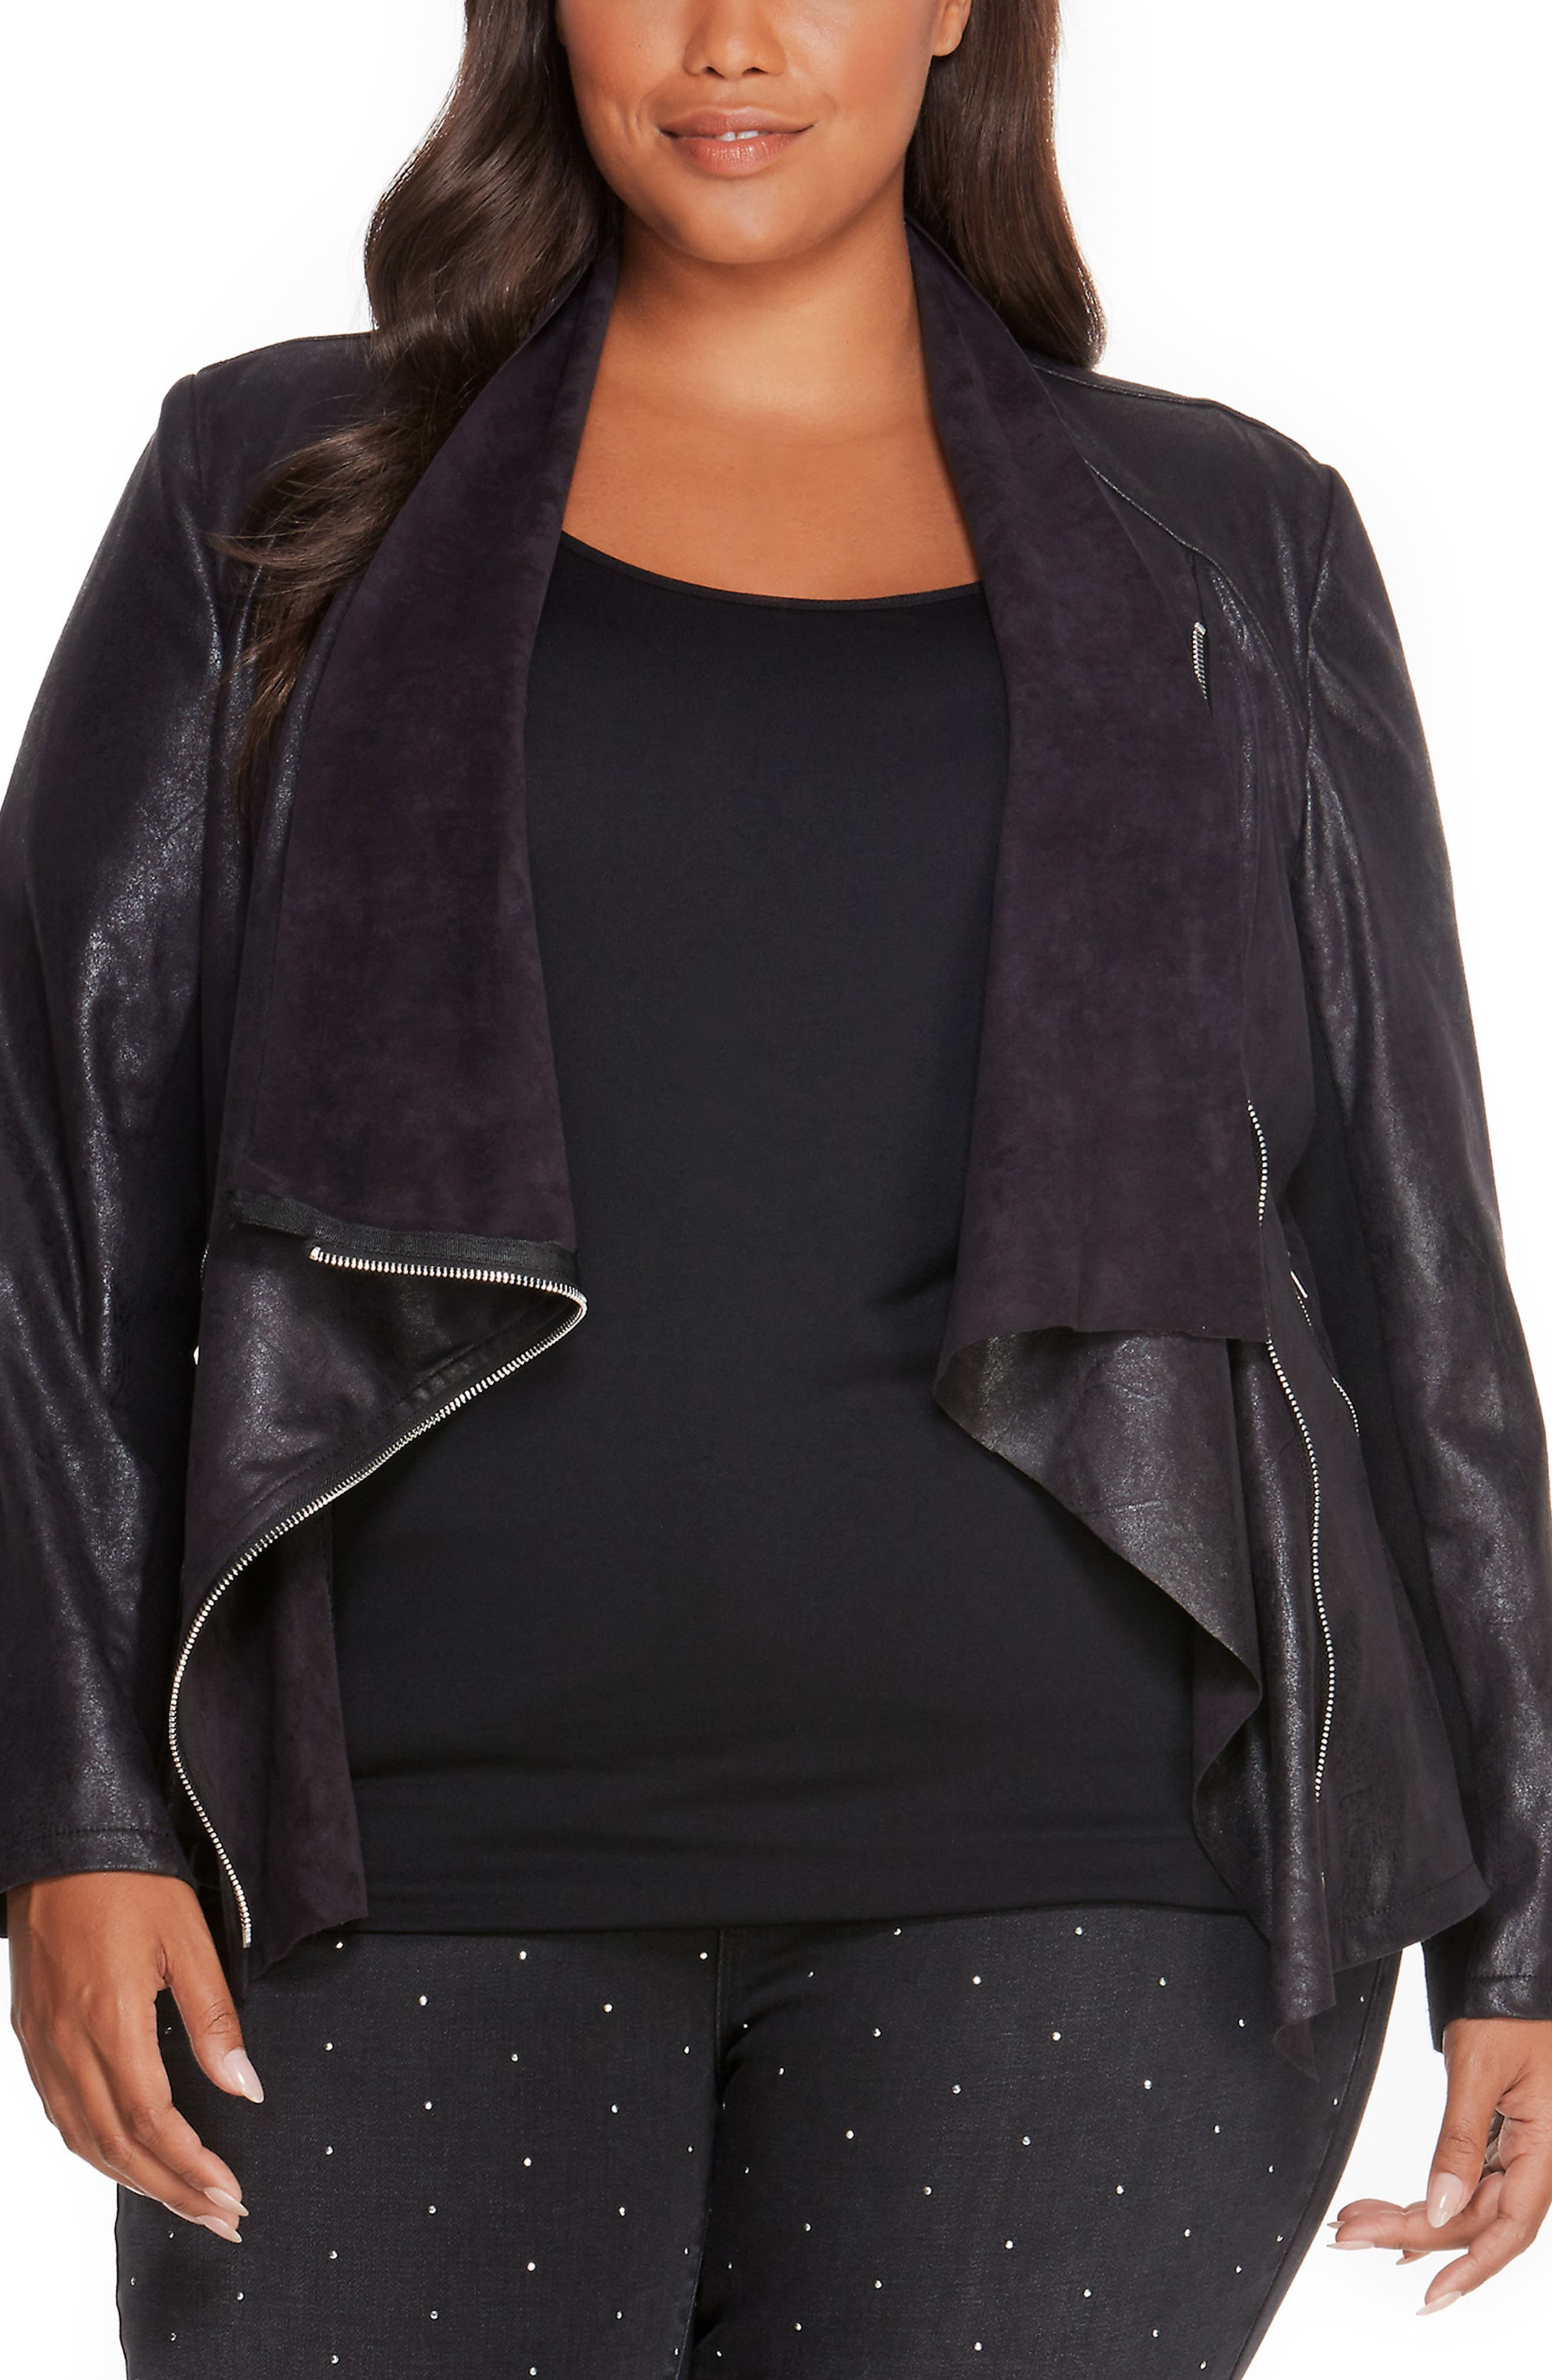 Main Image - REBEL WILSON X ANGELS Asymmetrical Faux Leather Jacket (Plus Size)